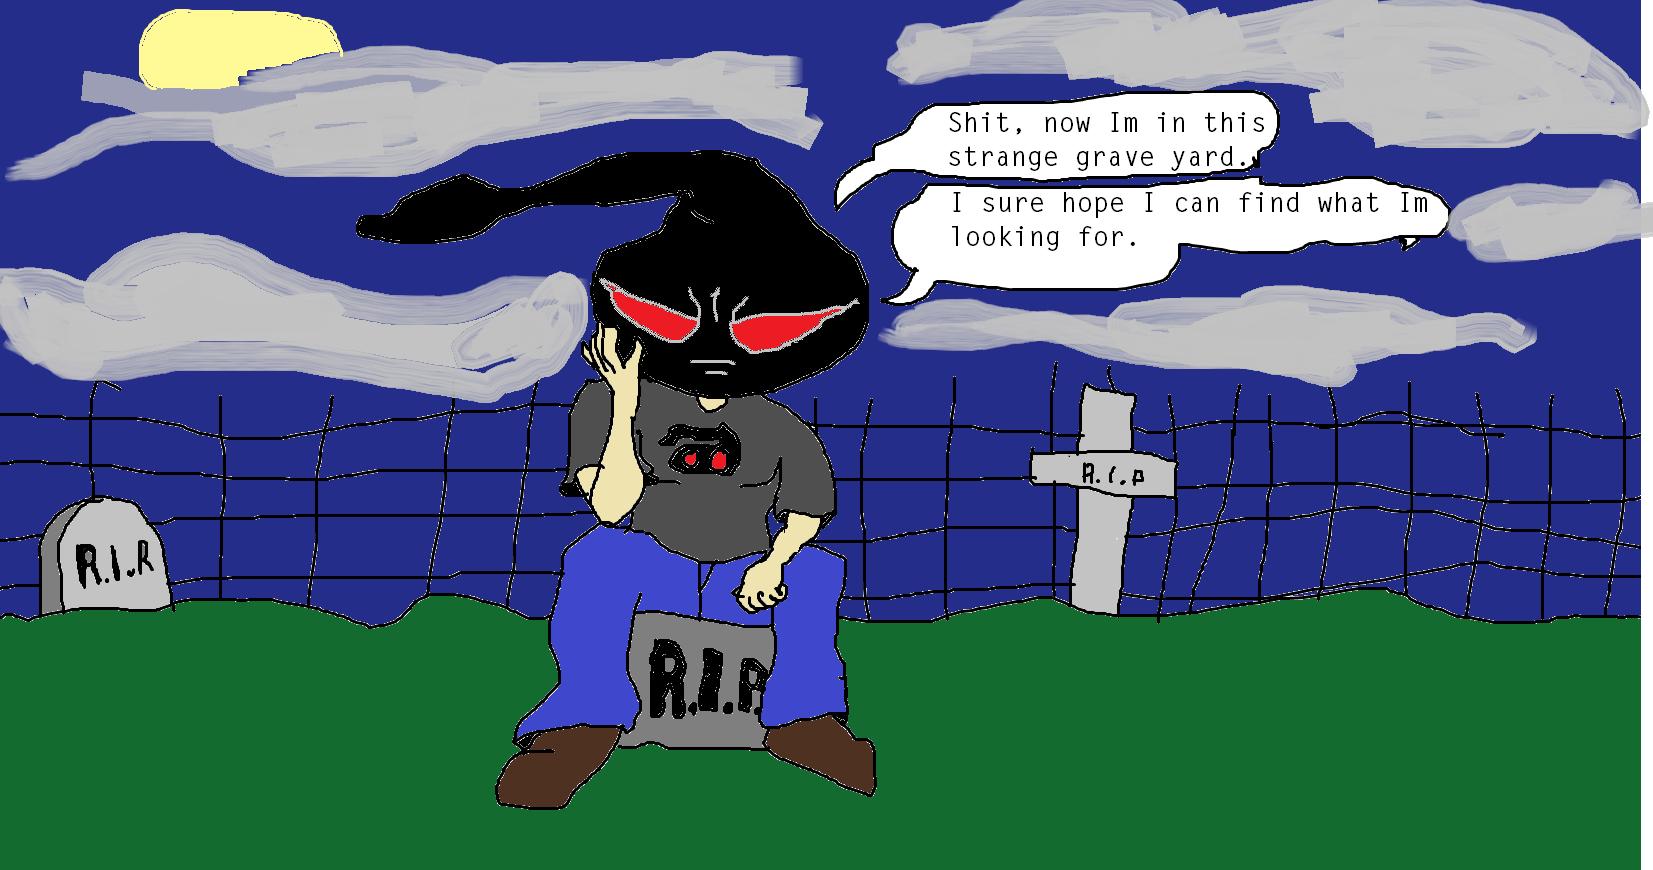 rebot in graveyard